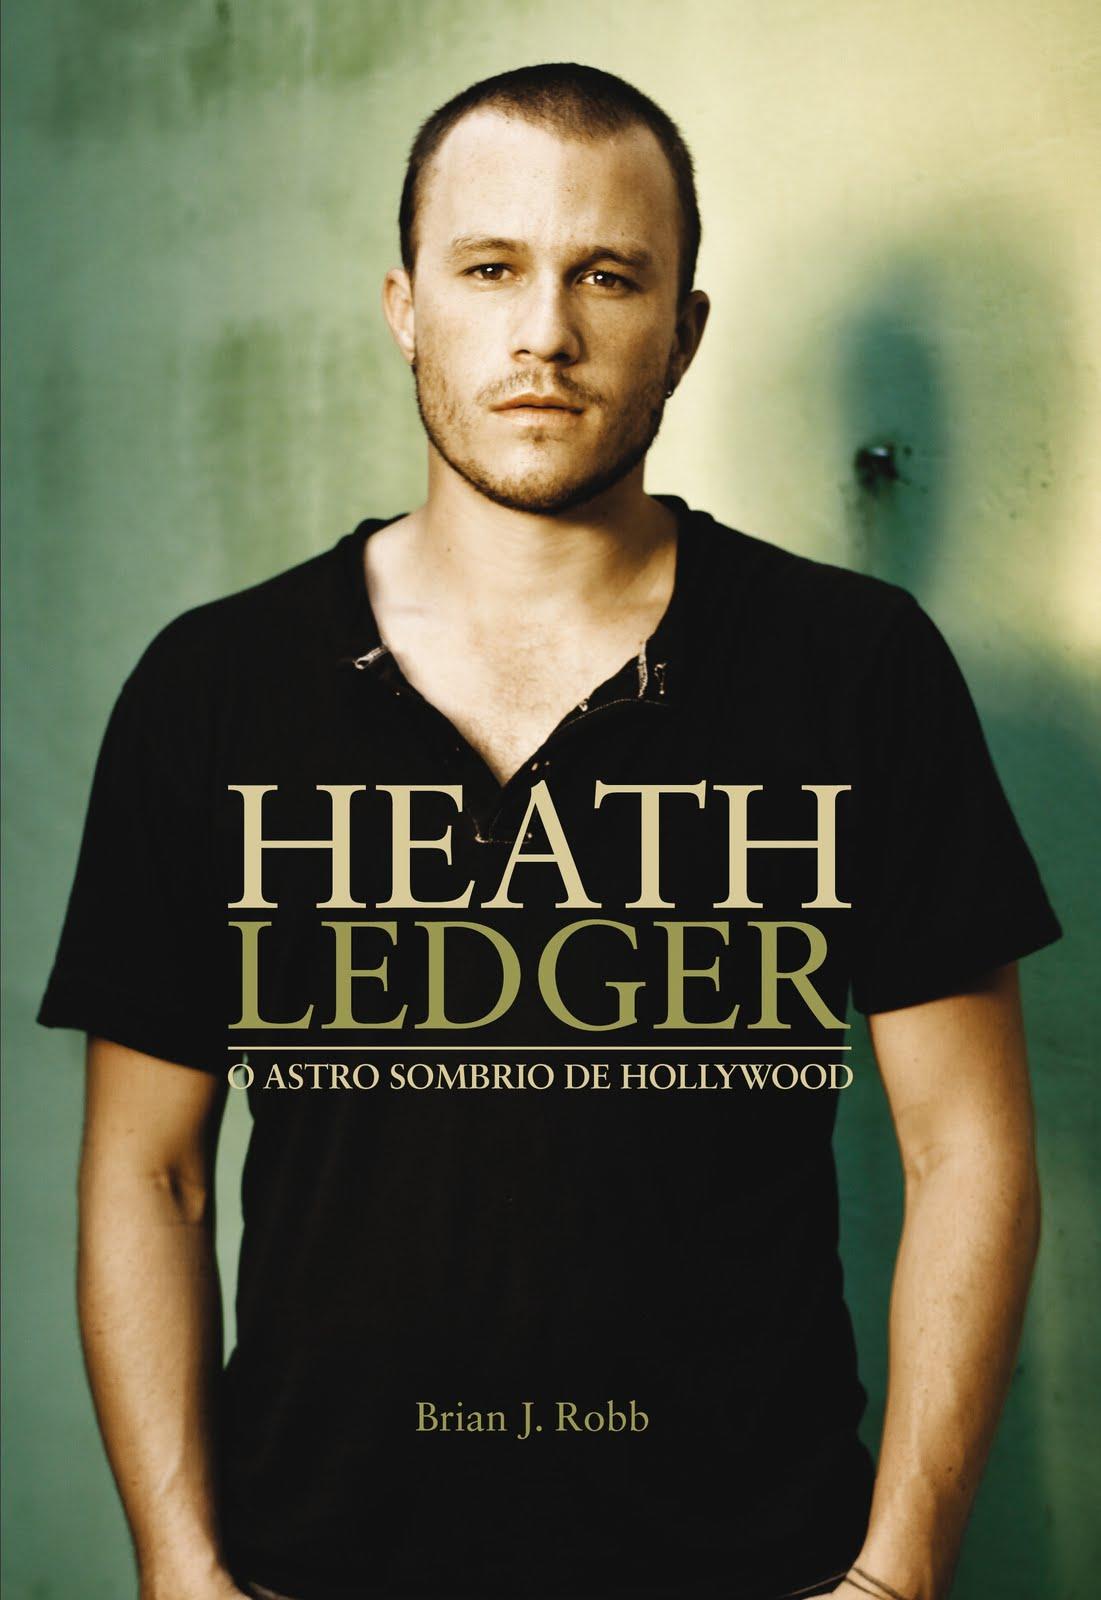 http://1.bp.blogspot.com/-kVj2LRFuKVk/T6kB_6opVLI/AAAAAAAAFCQ/m-LvoQldauw/s1600/Heath_Ledger-Padrao.JPG